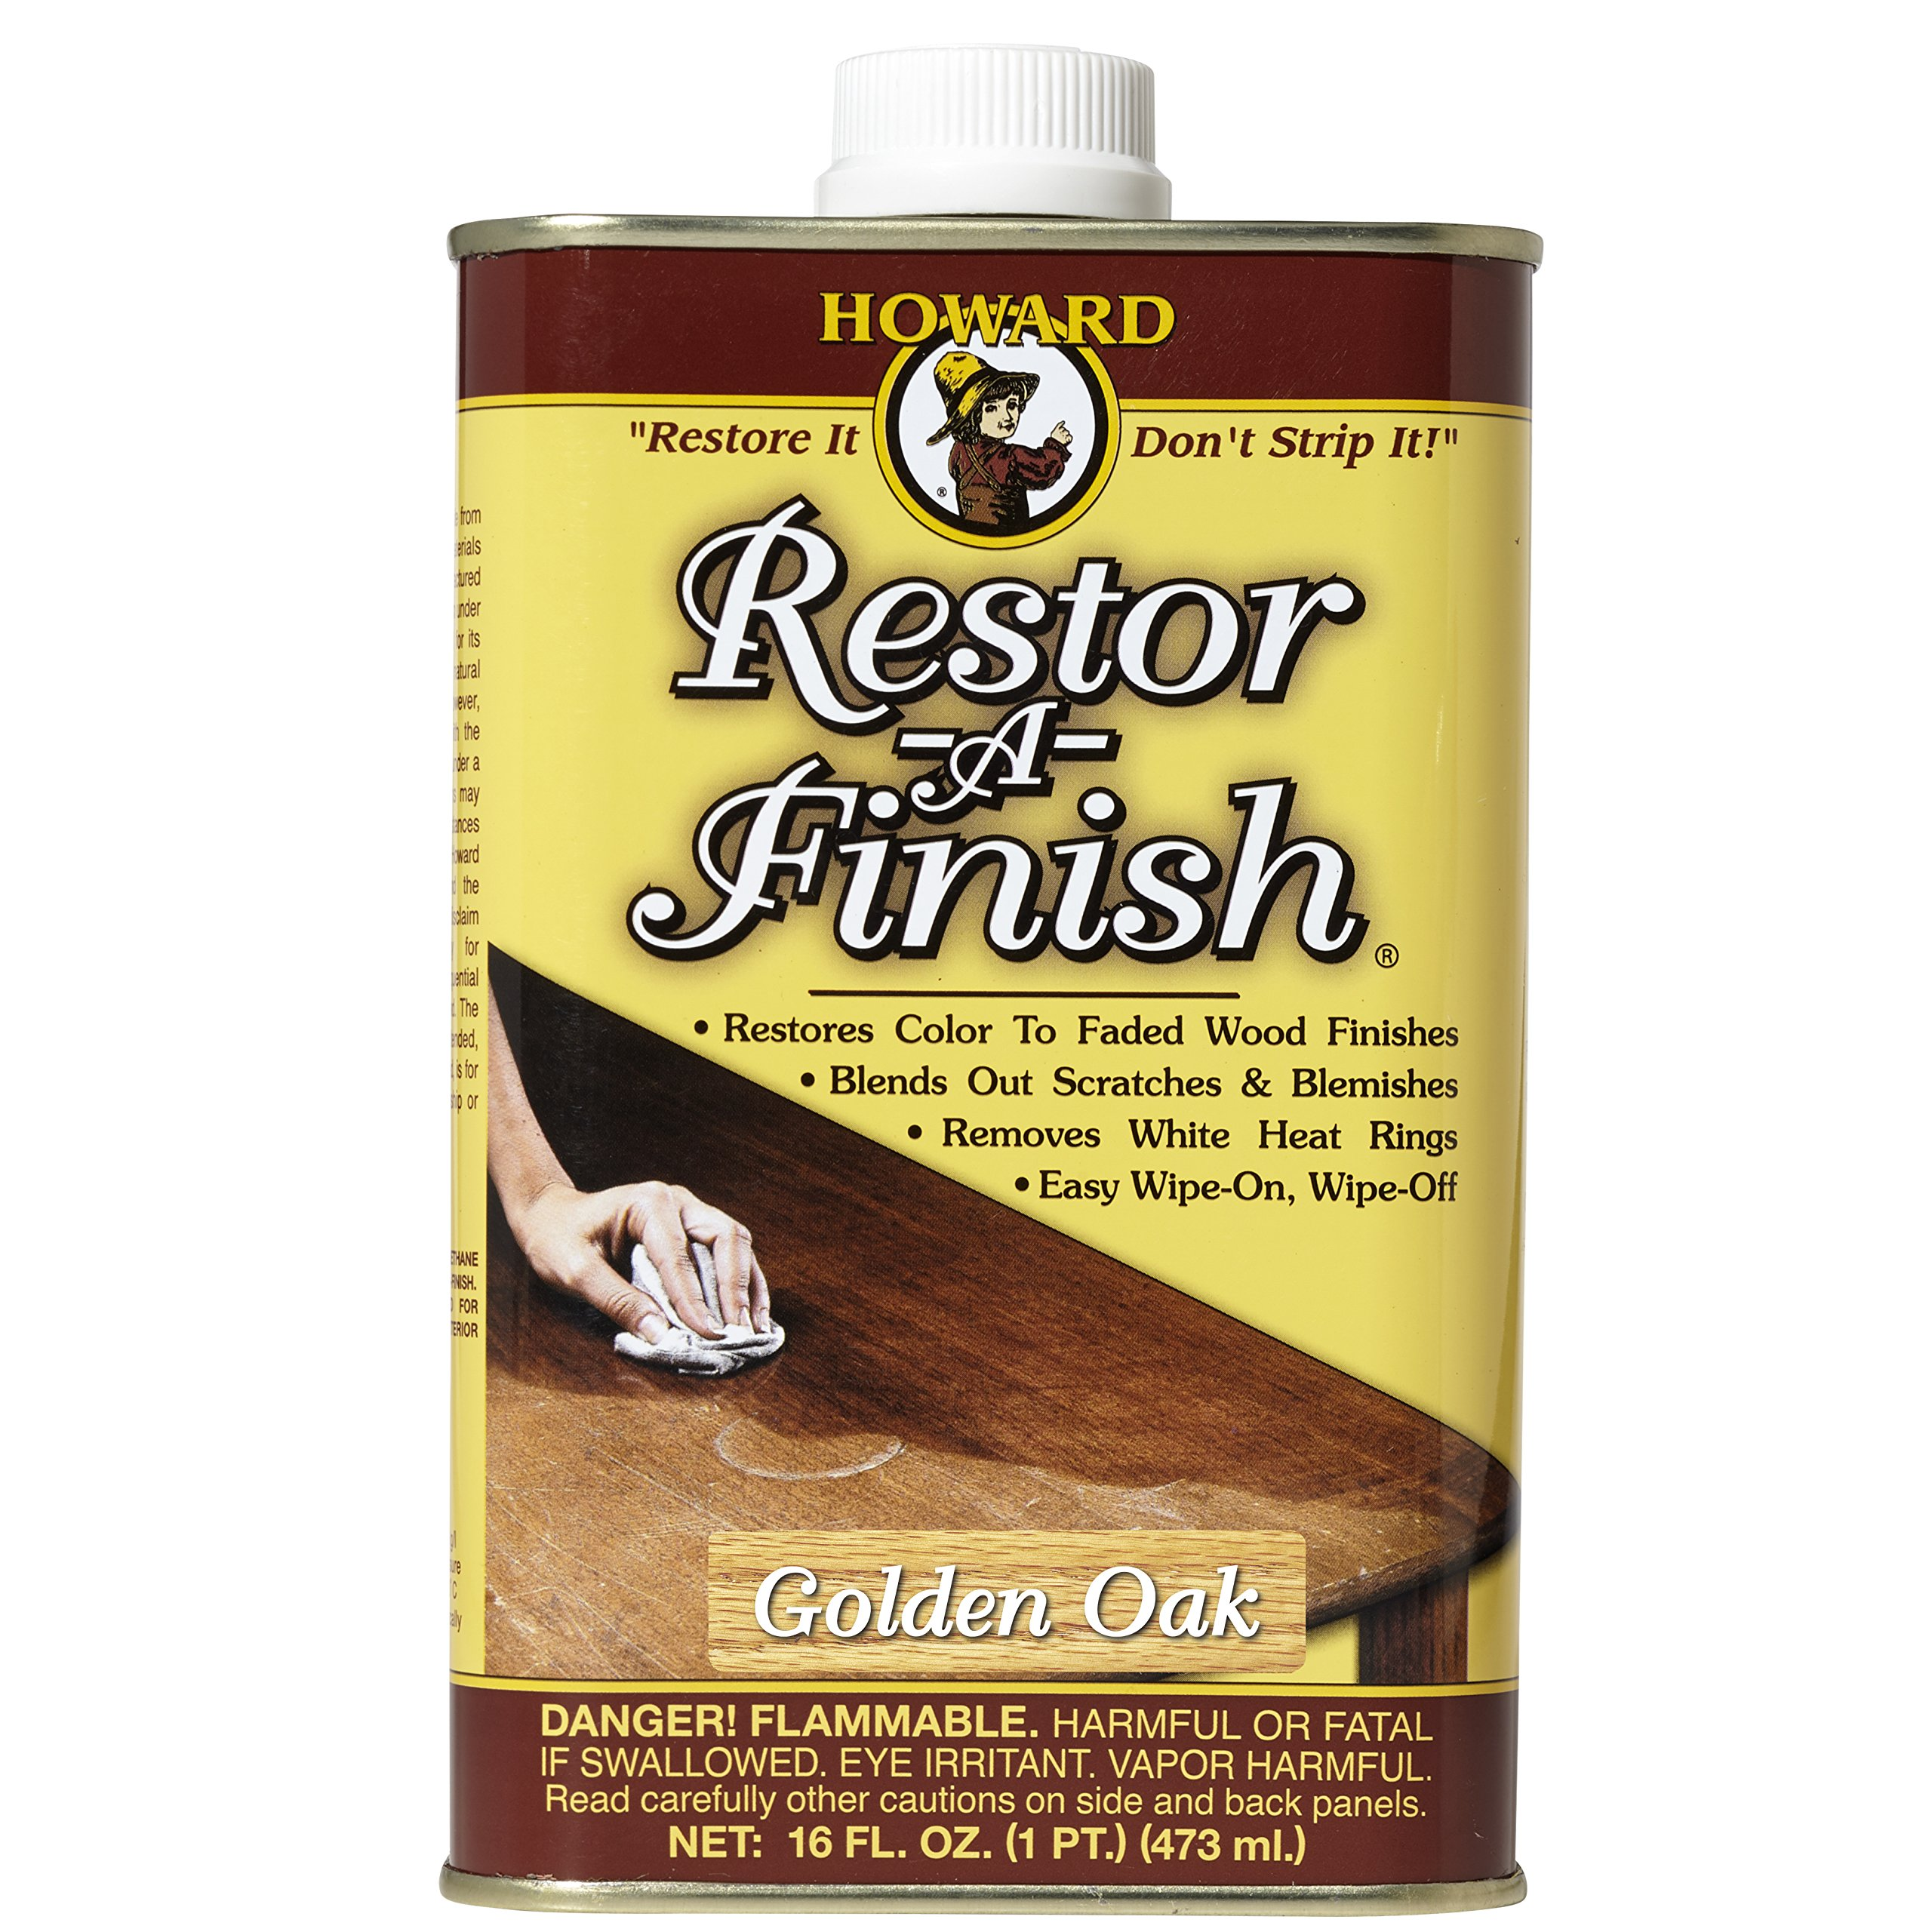 Howard Products RF3016 Restor-A-Finish, 16 oz, Golden Oak